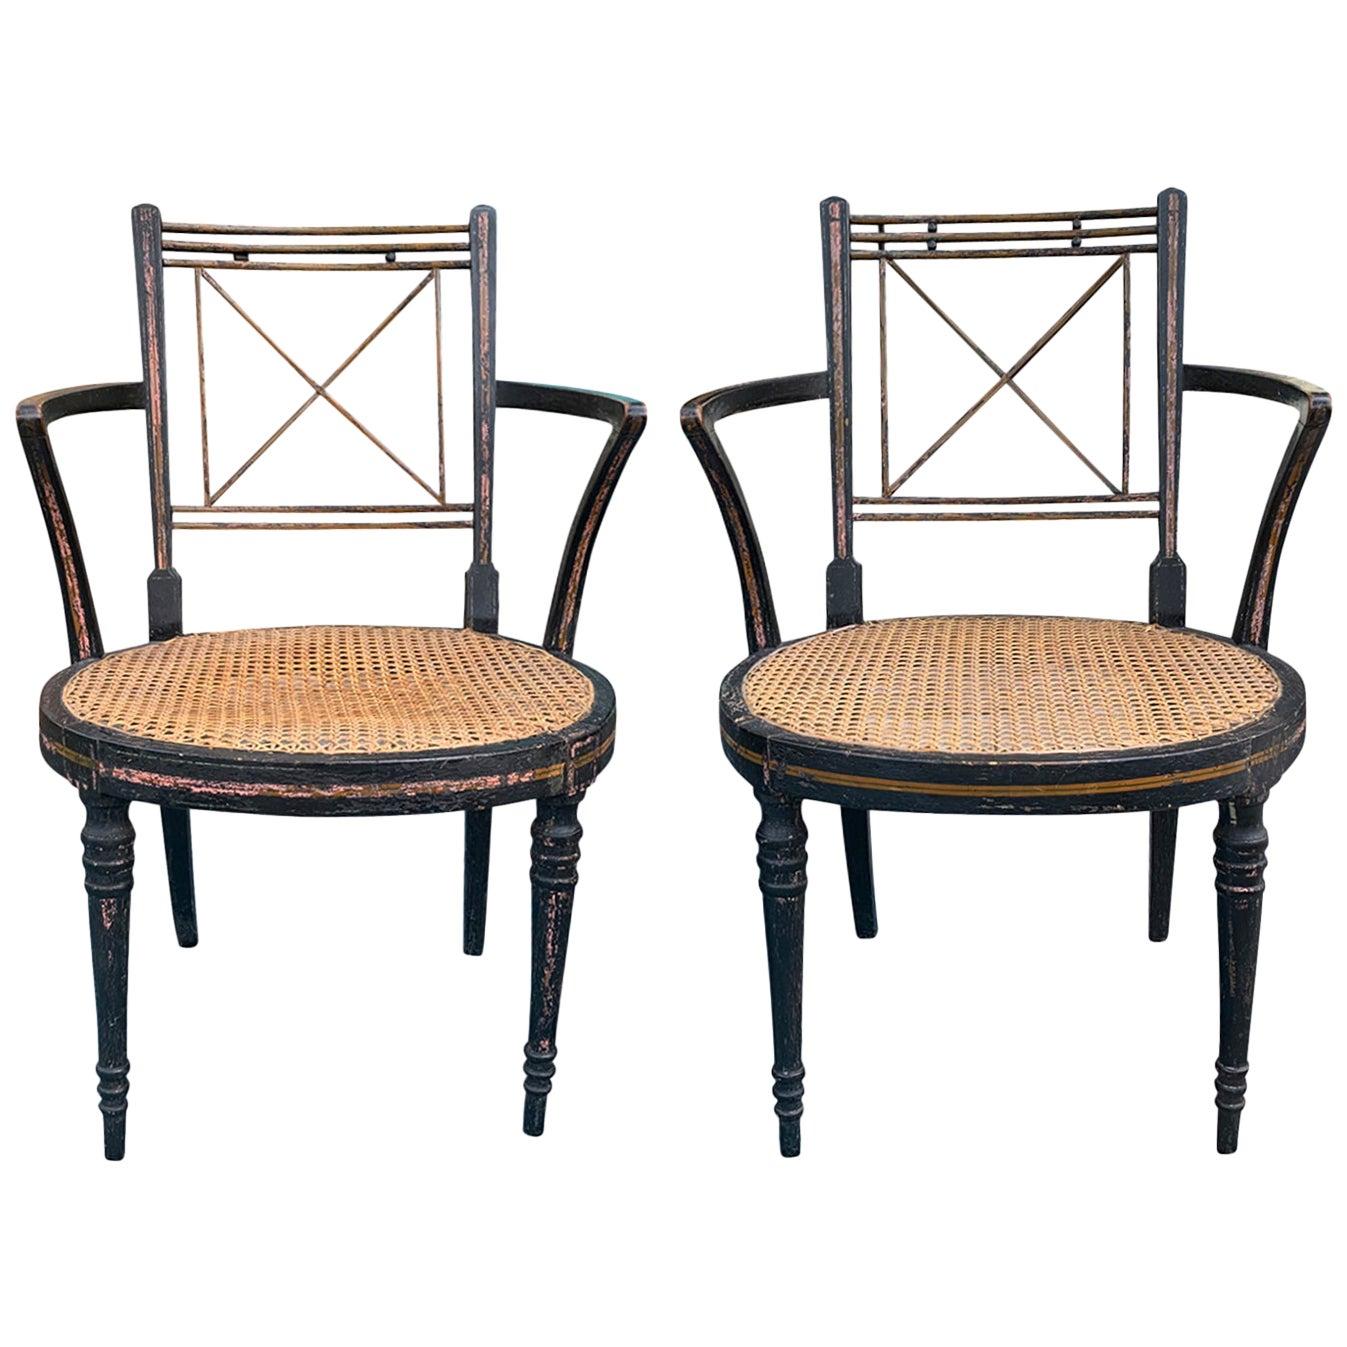 Pair of Ebonized English Regency Armchairs with Cane Seats, circa 1810